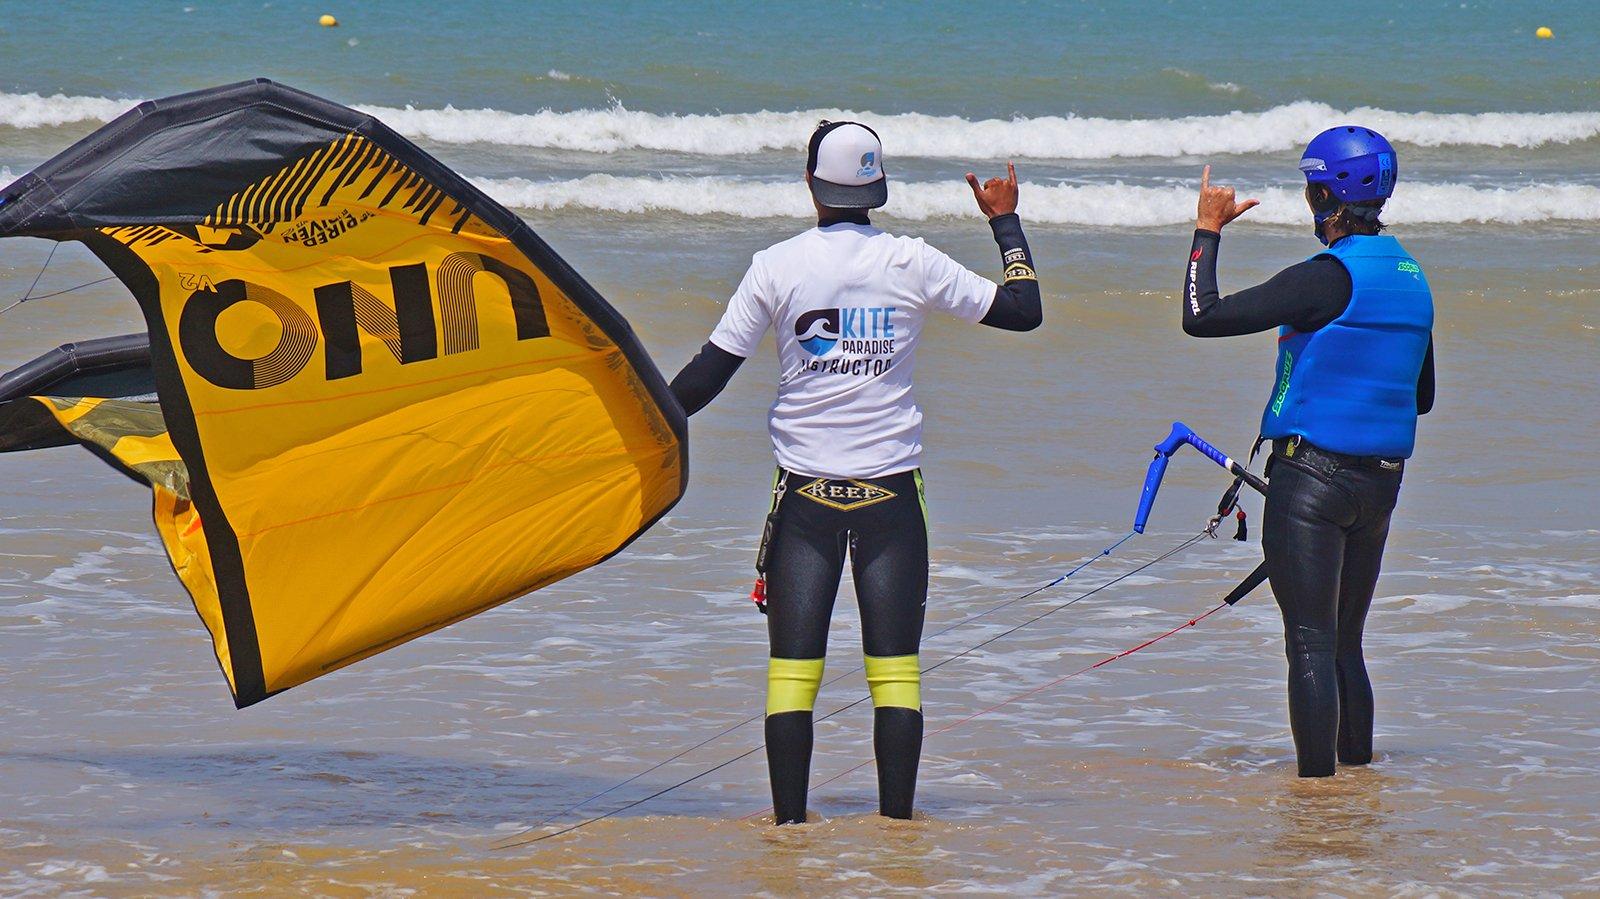 Prix stage kitesurf